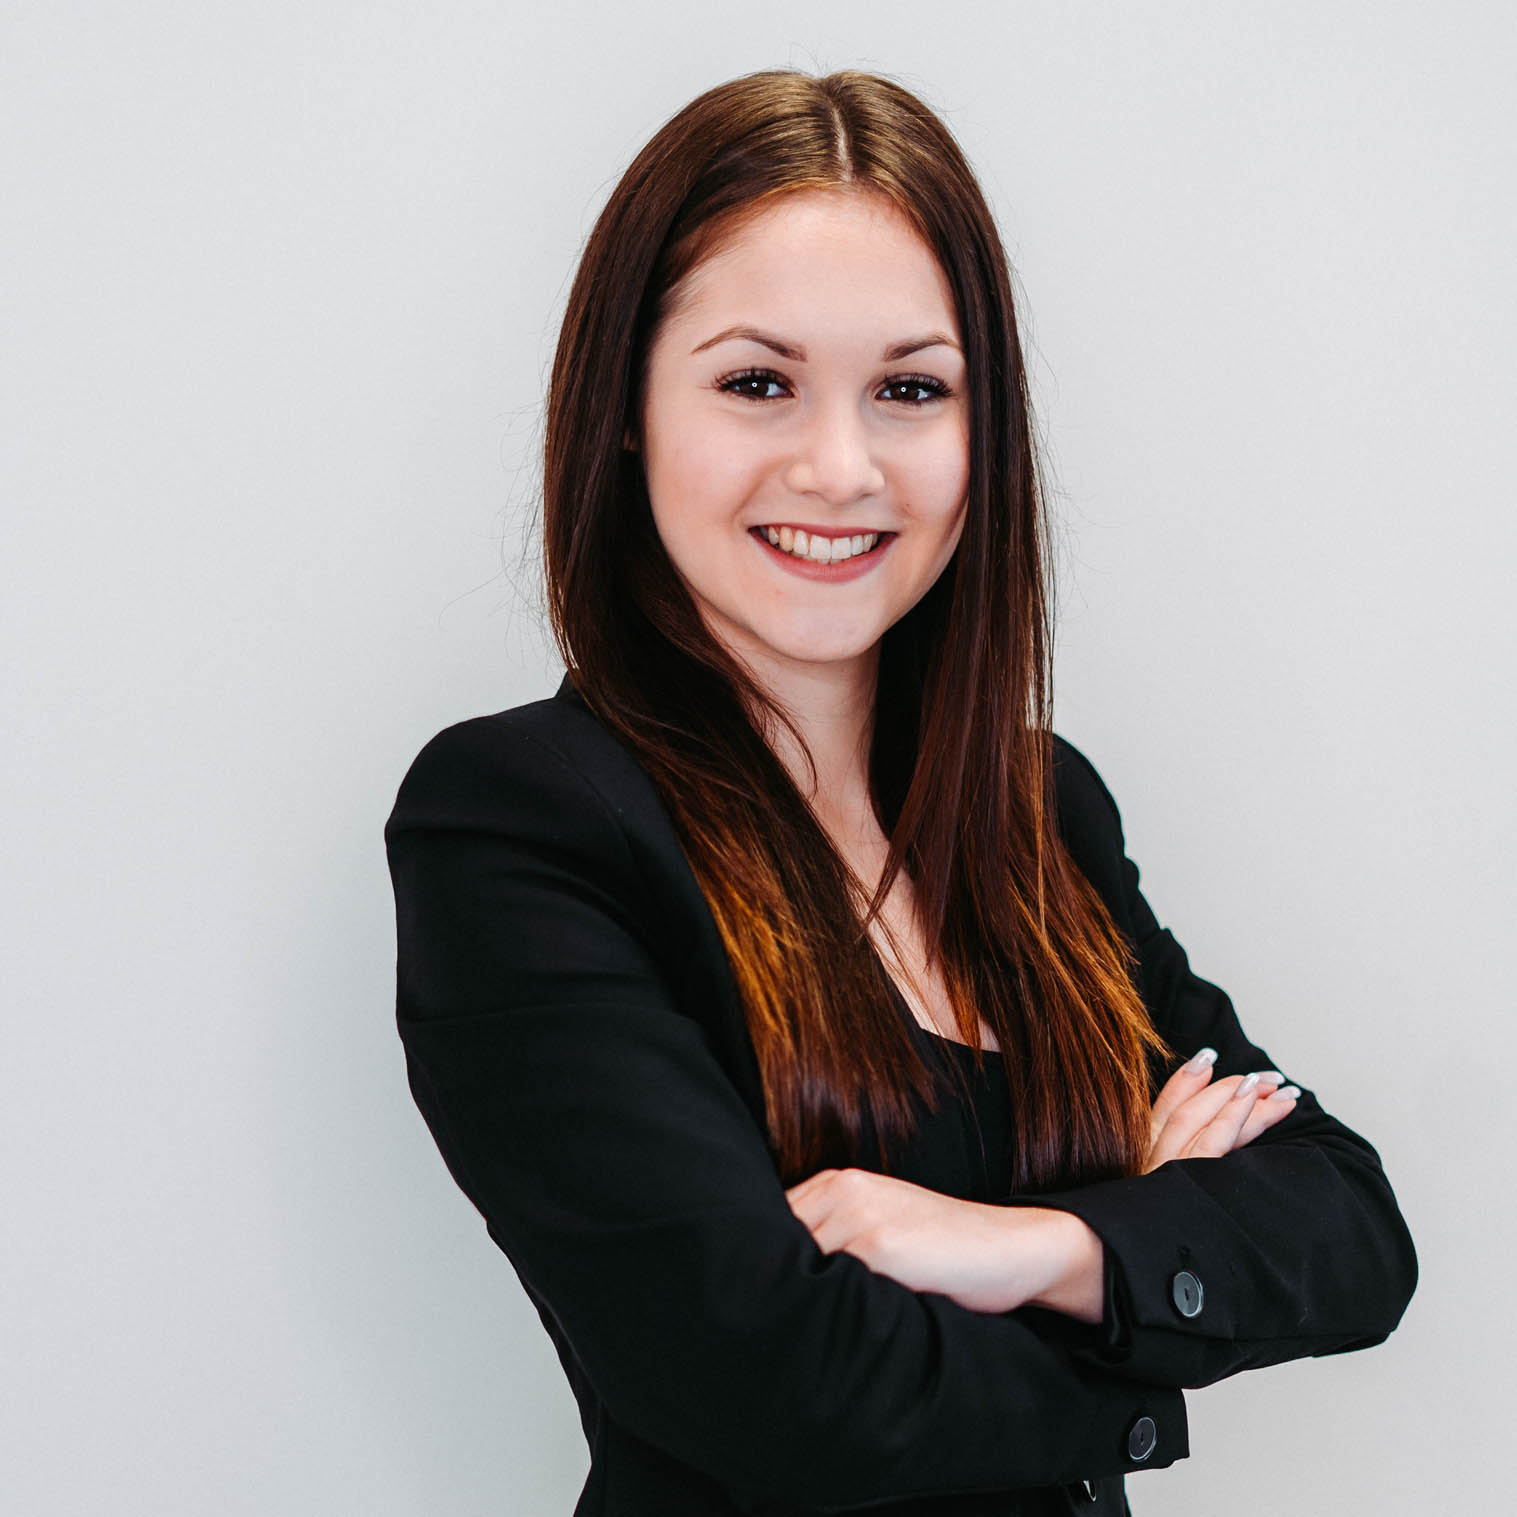 Francesca Reimer